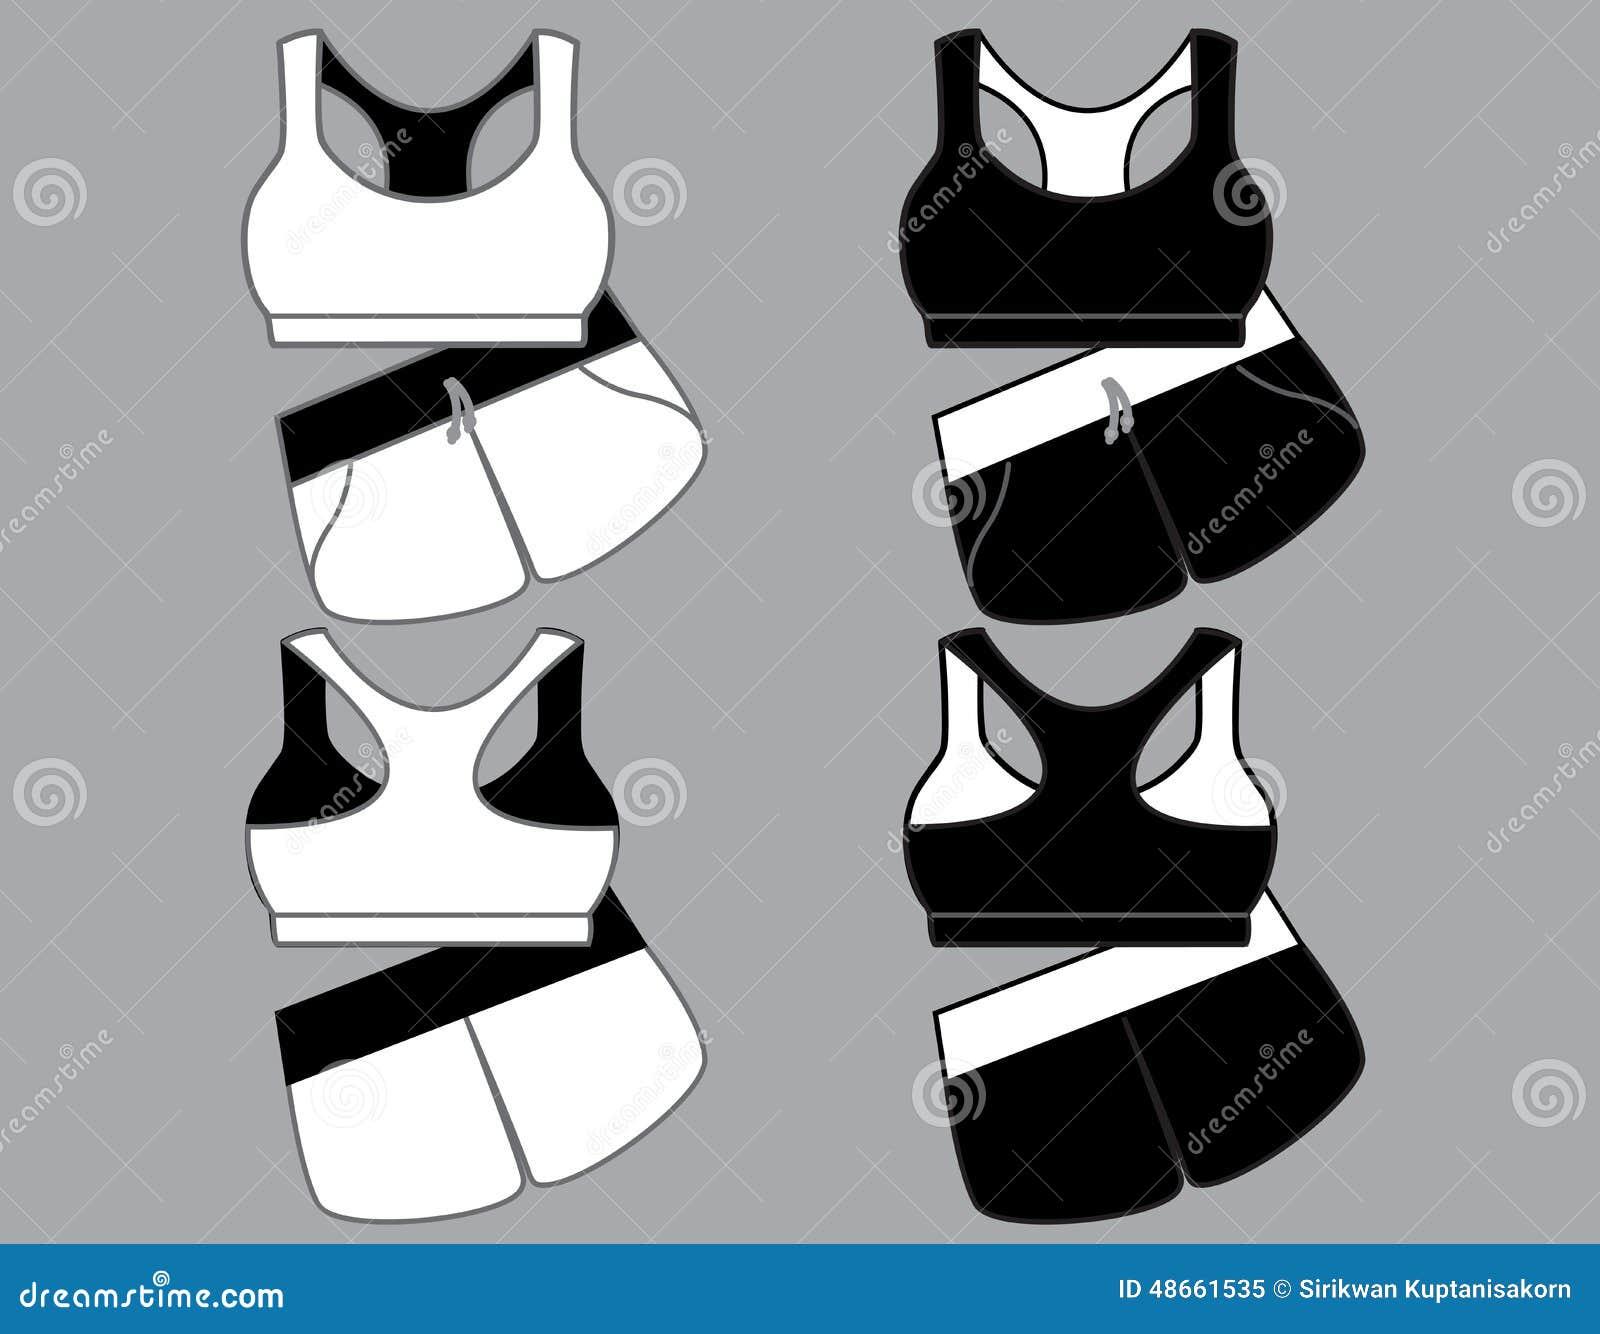 08d600c9bc7a3 Women s Sport Underwear. Bra And Shorts. Stock Illustration ...